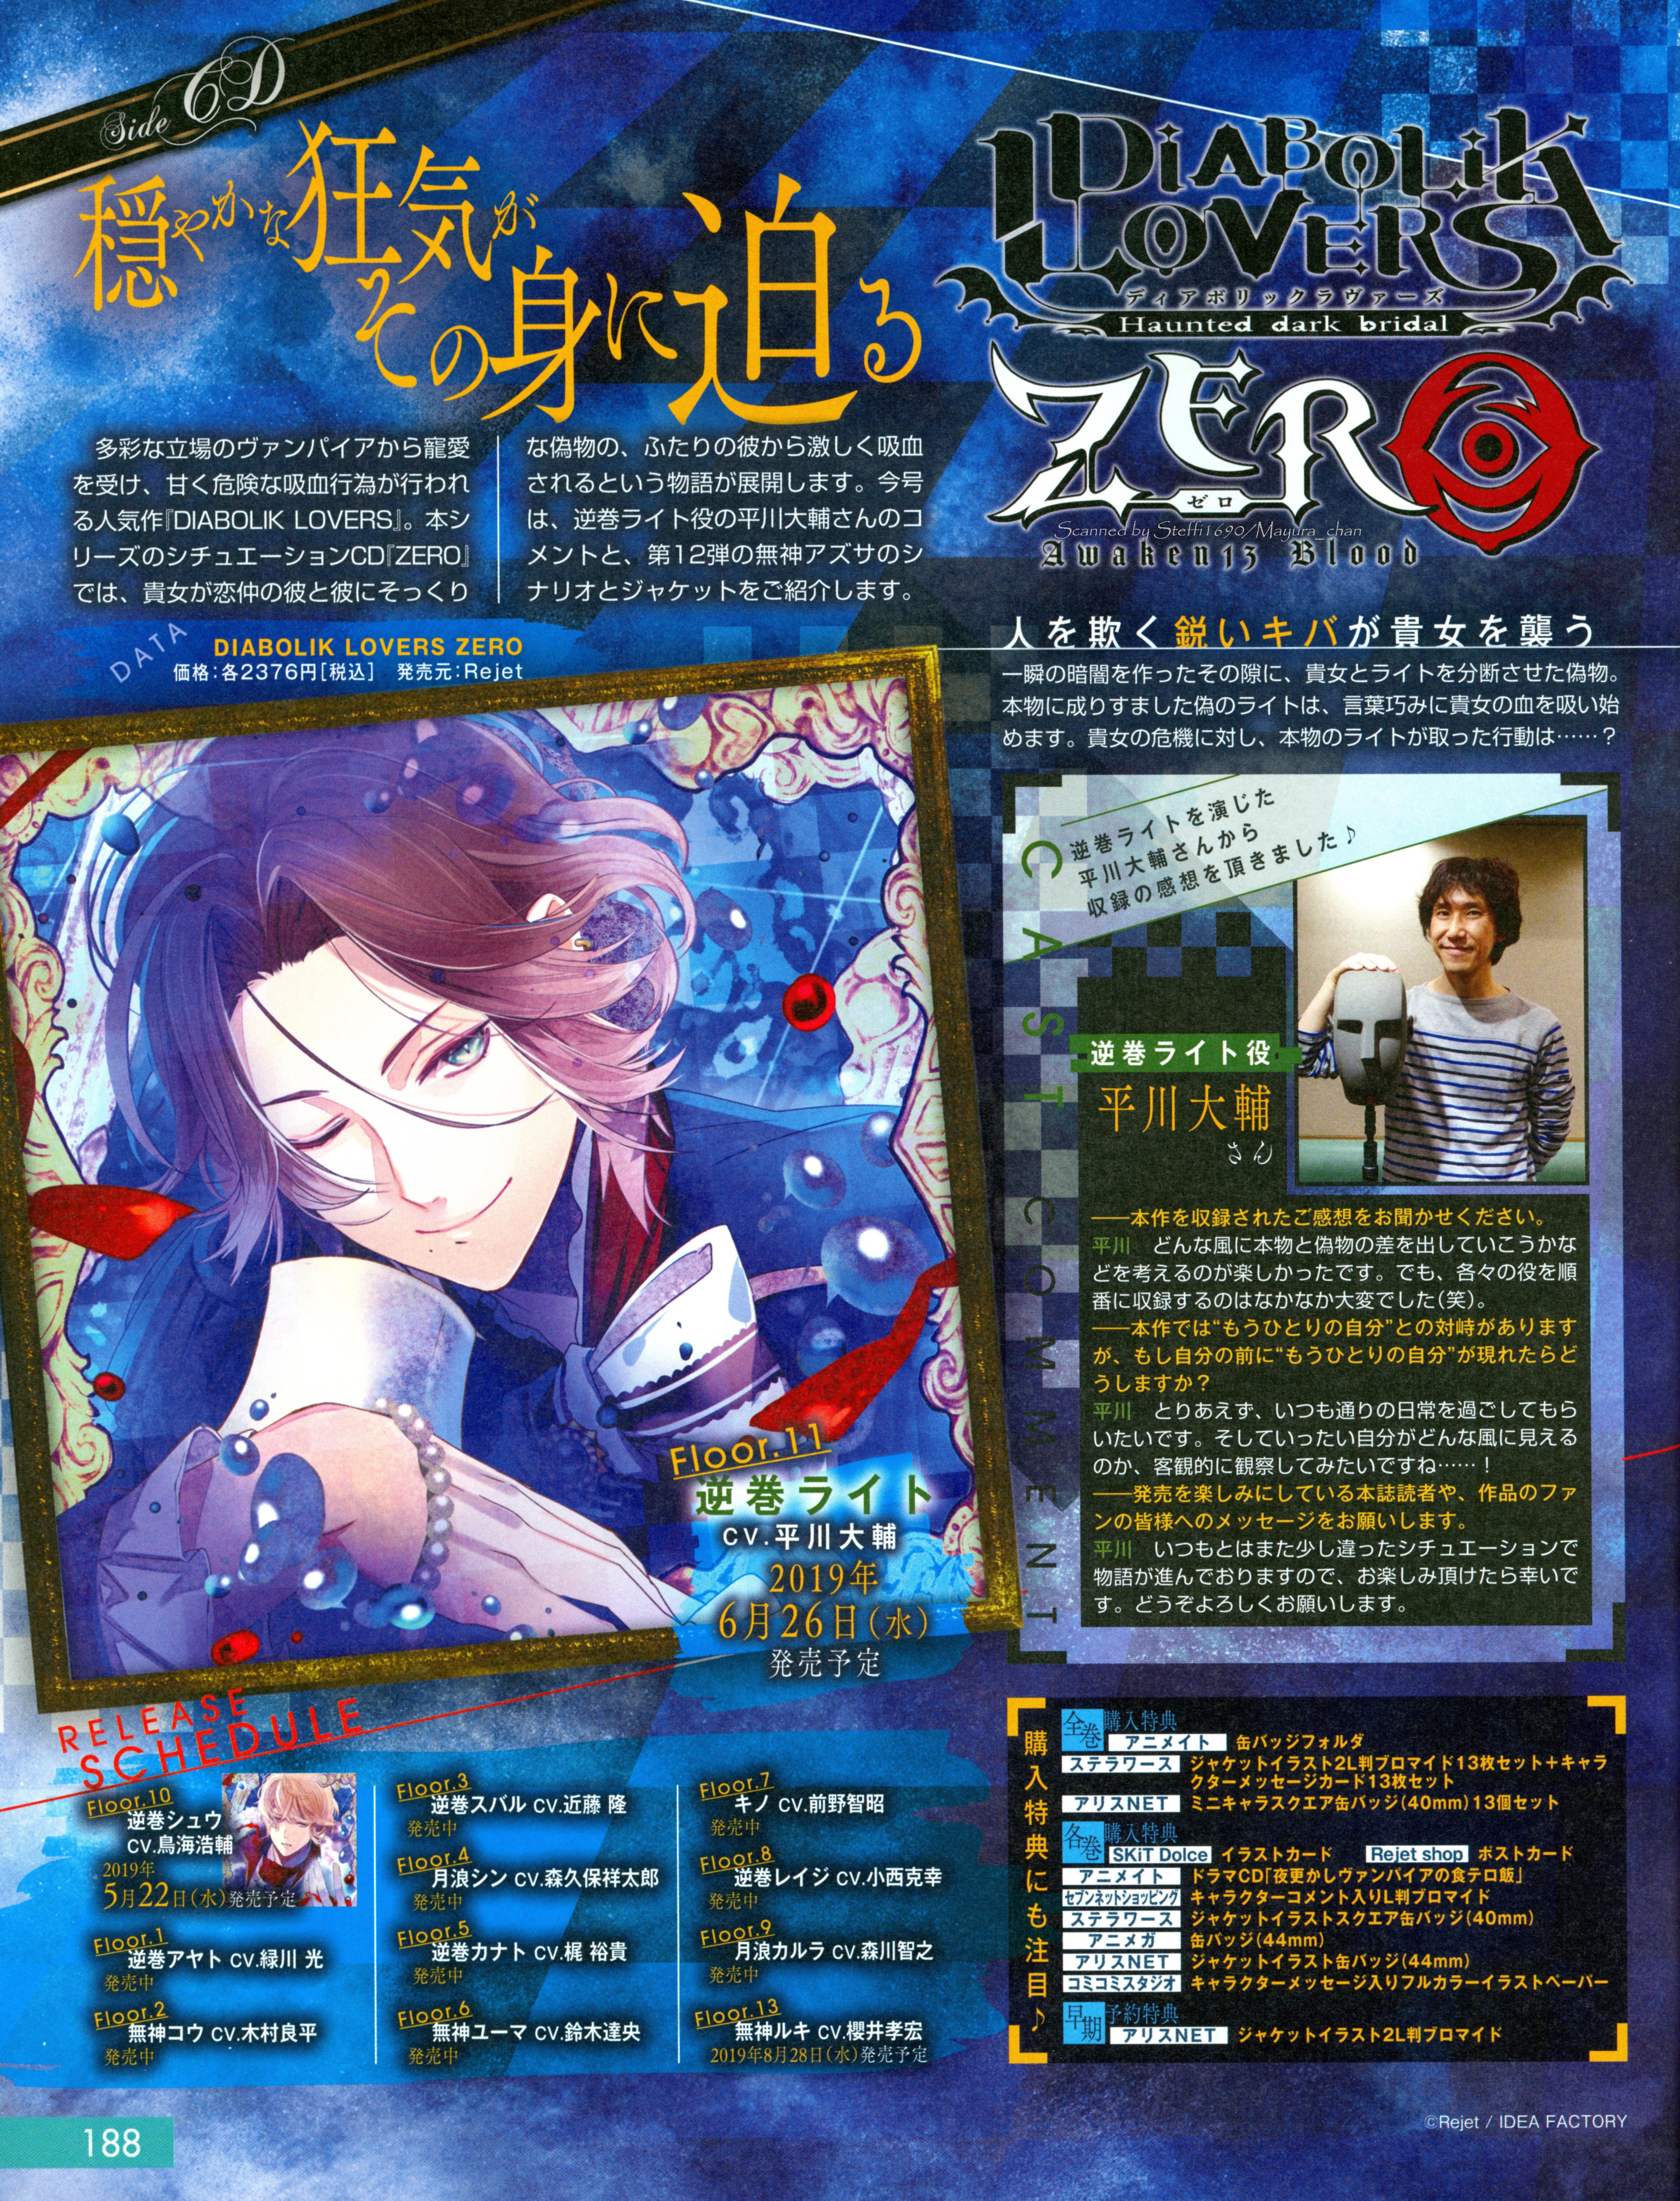 Sakamaki Laito - Diabolik Lovers ~Haunted dark bridal~ - Mobile